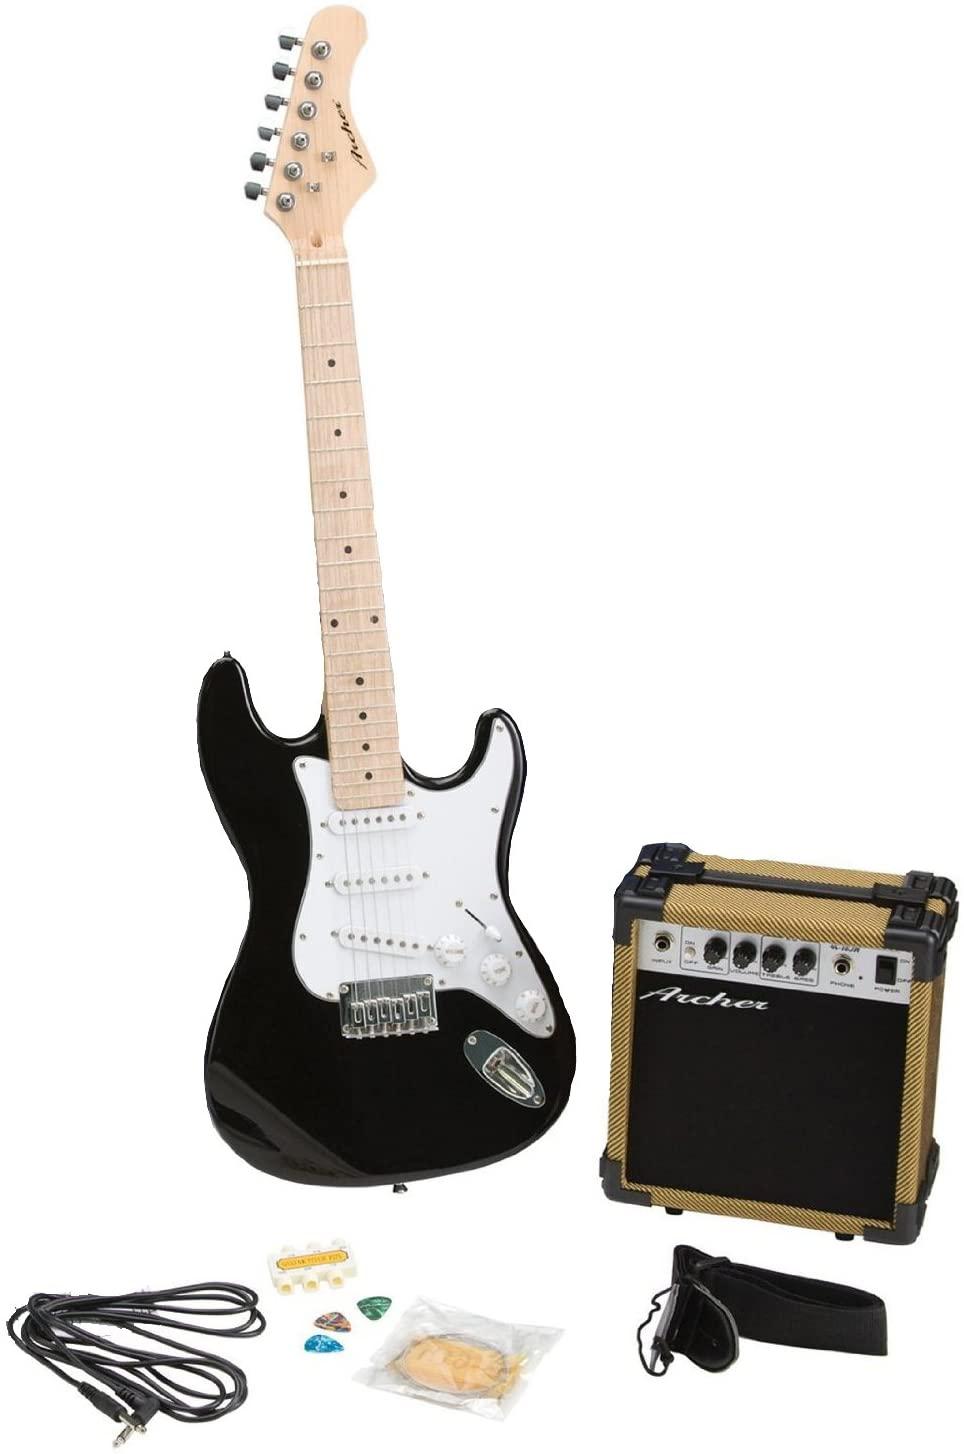 Archer SS10JRPAKBK Blues and Rock Junior Electric Guitar Package, Black